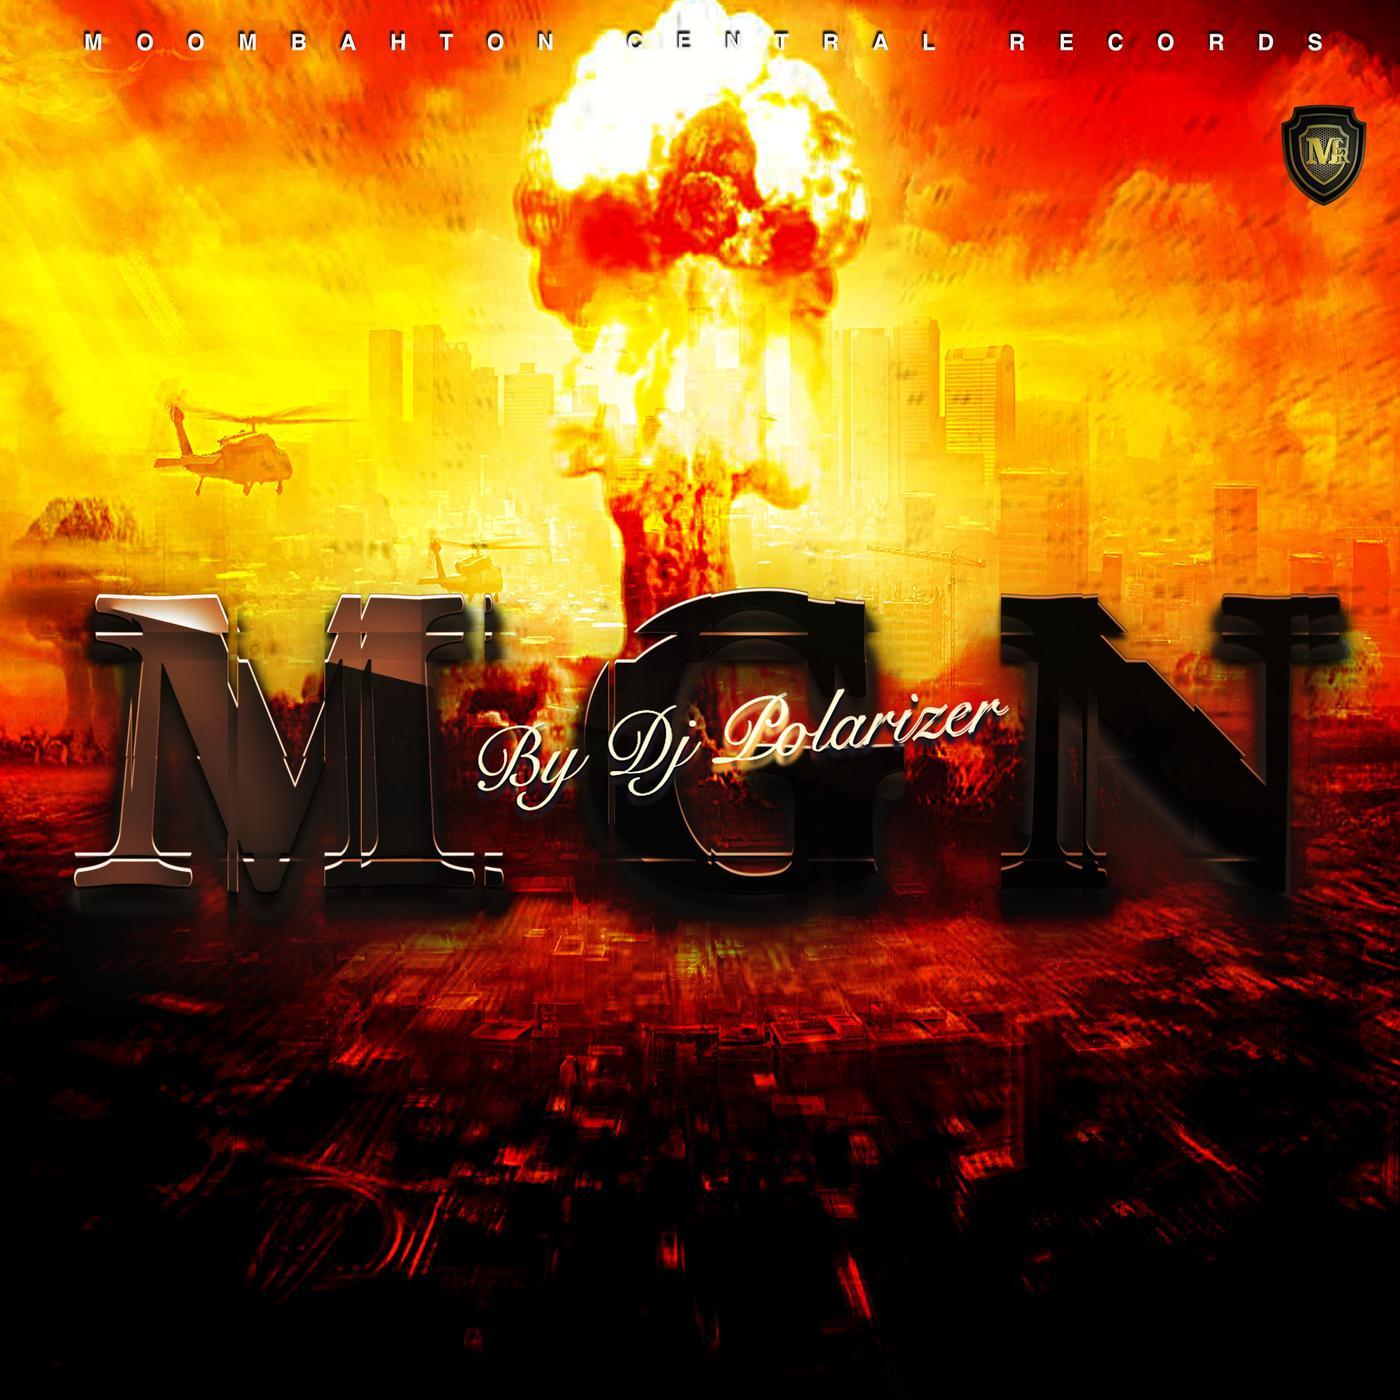 Moombahton Central Records (podcast) - DJ Polarizer | Listen